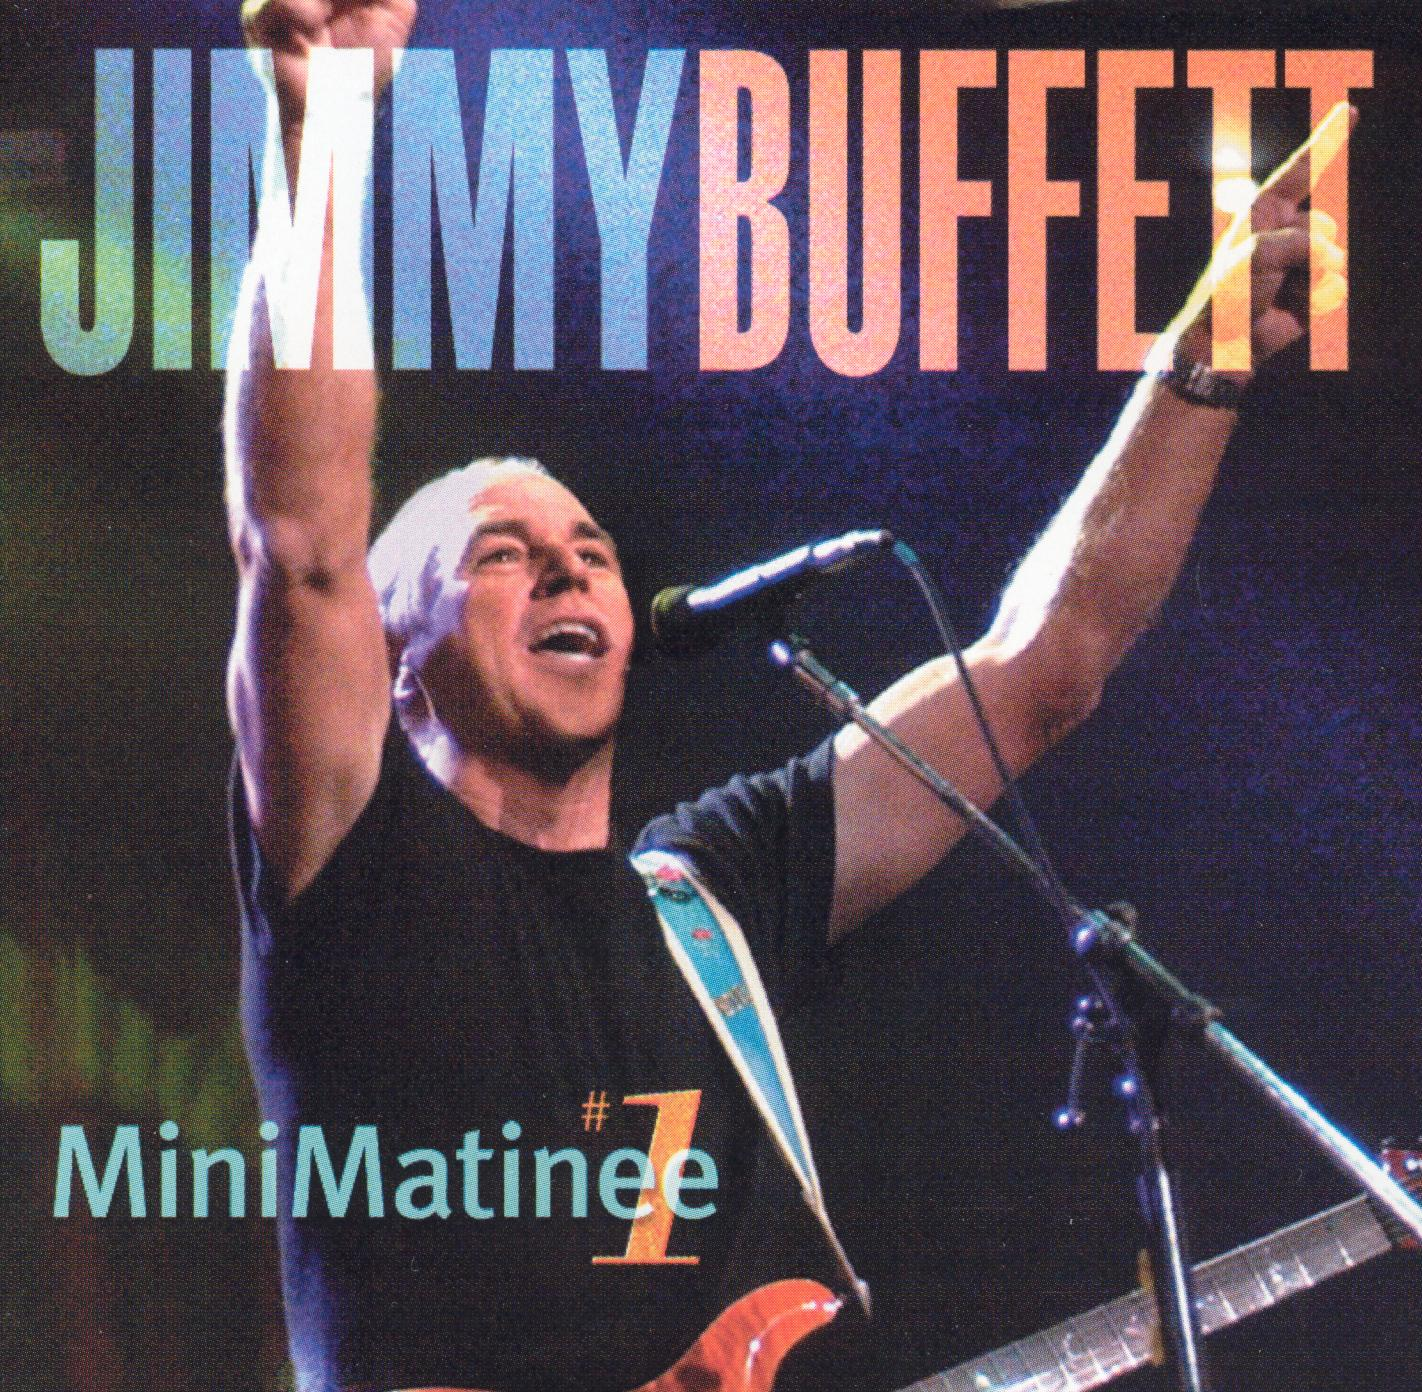 Jimmy Buffett: MiniMatinee #1